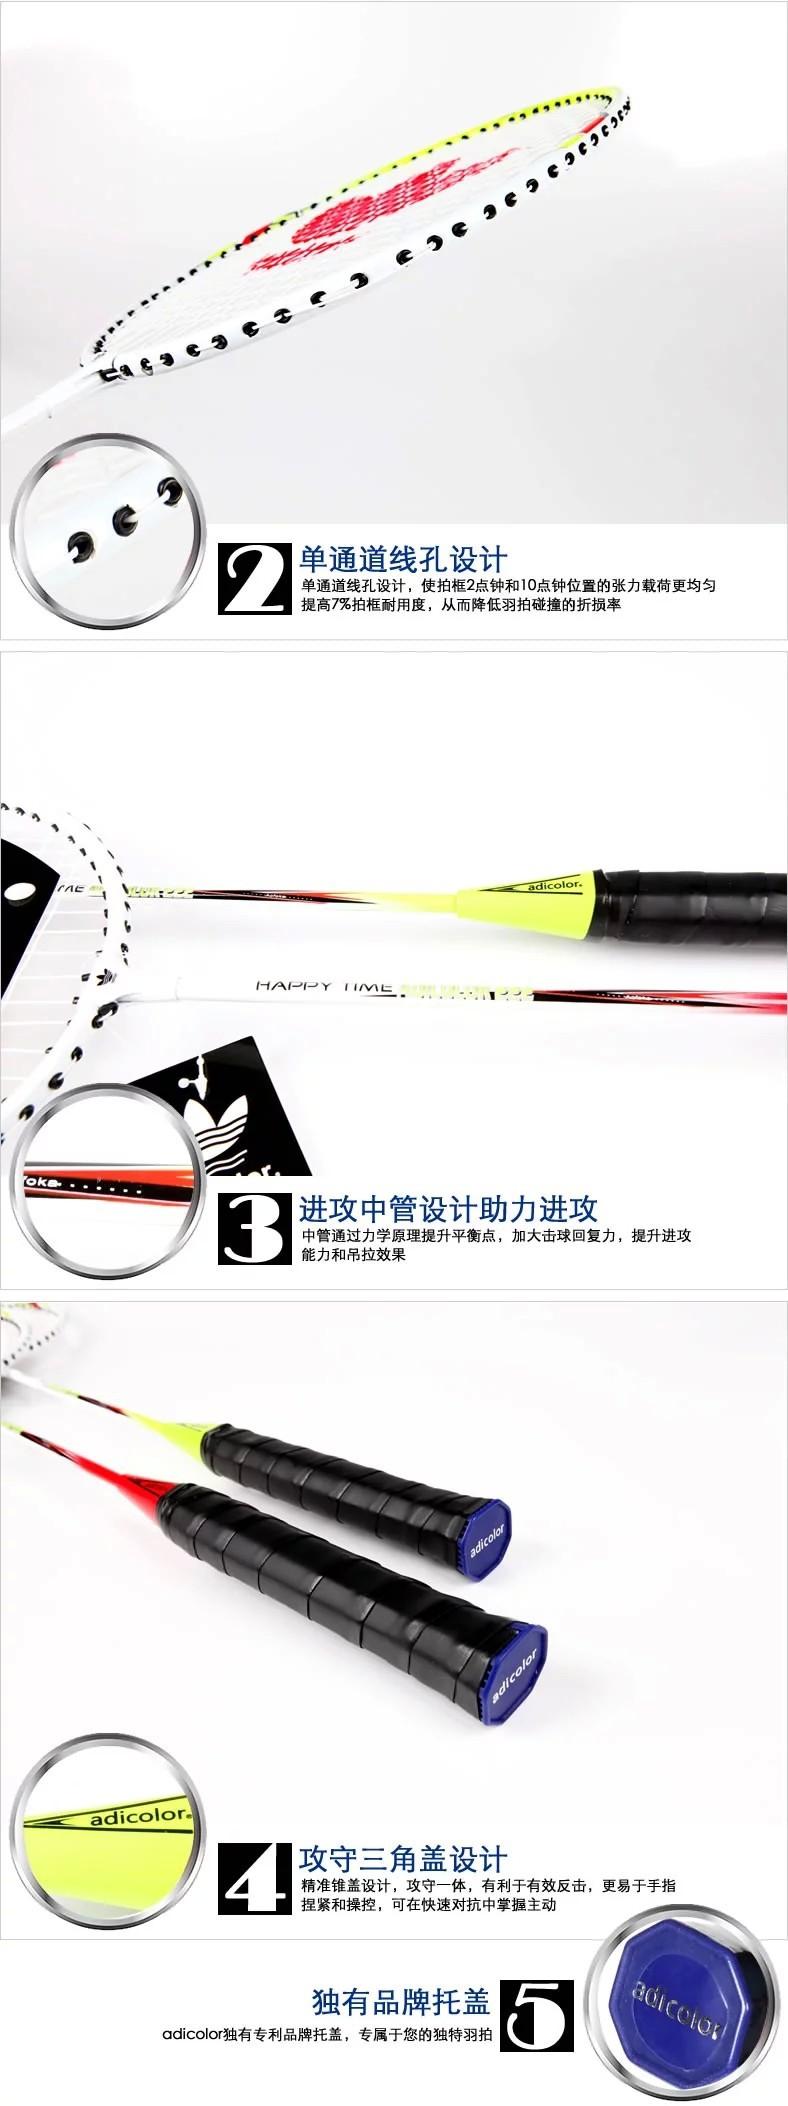 ракетка для бадминтона Batp Wer , & 3 BP-1344